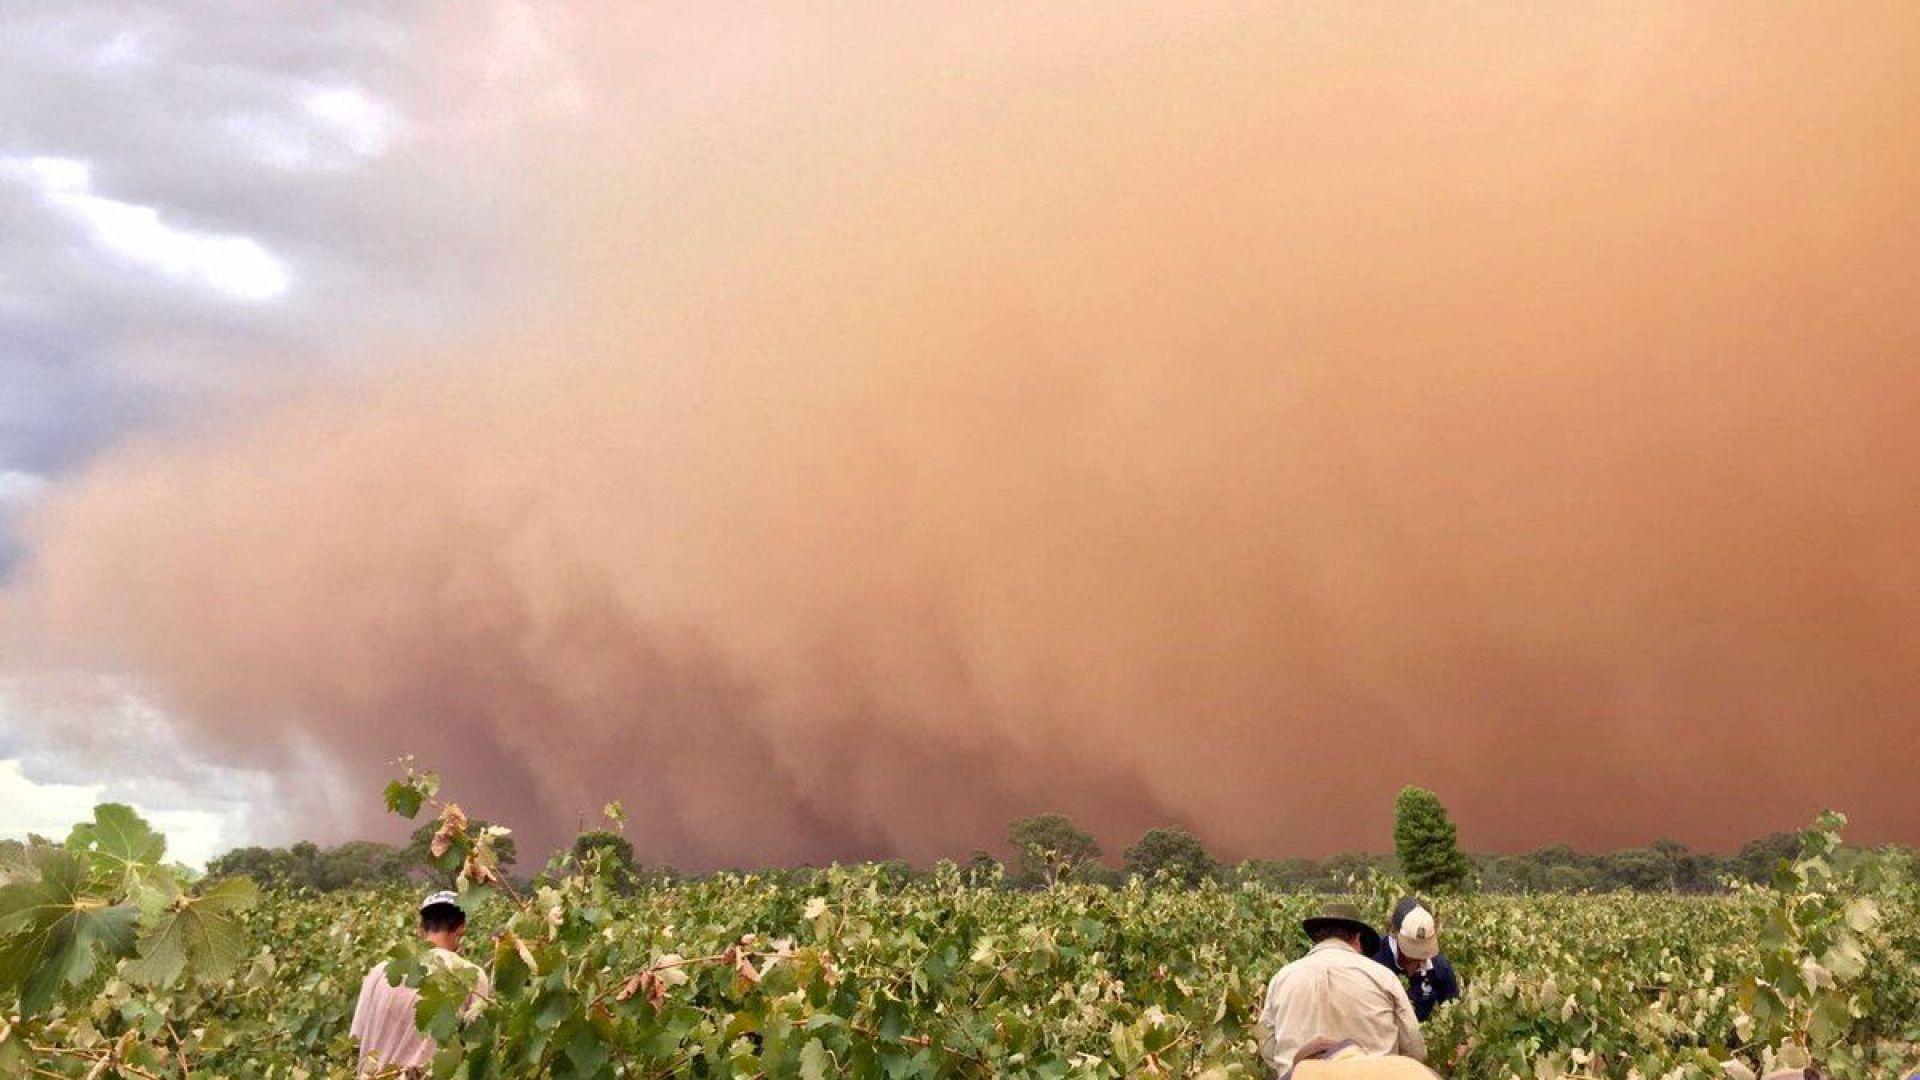 Пясъчна буря опустоши район в Австралия (видео)